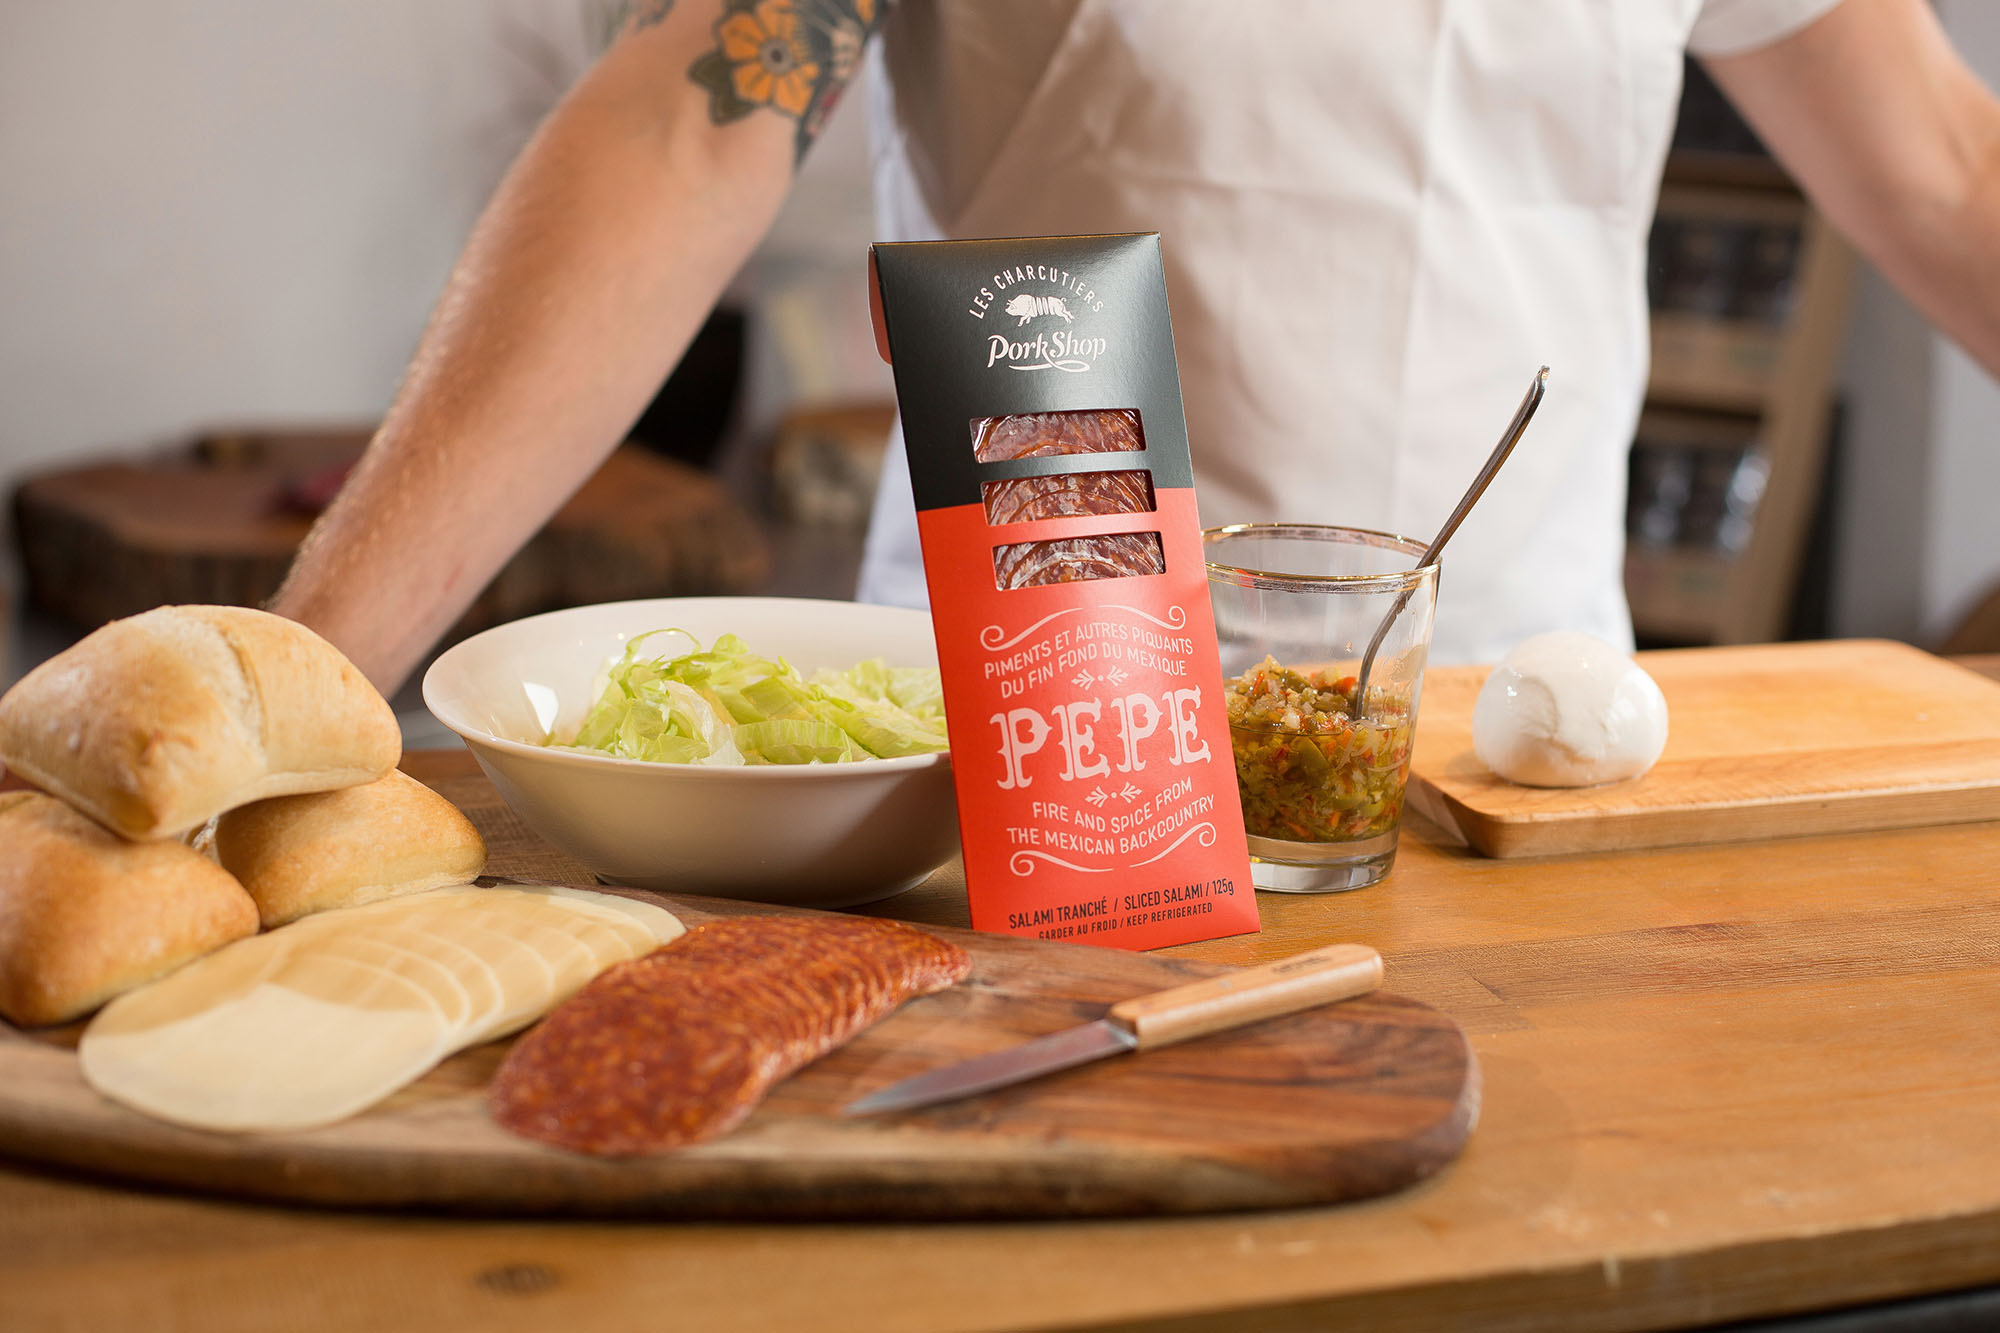 salami-pepe-tranché-sliced-sml.jpg